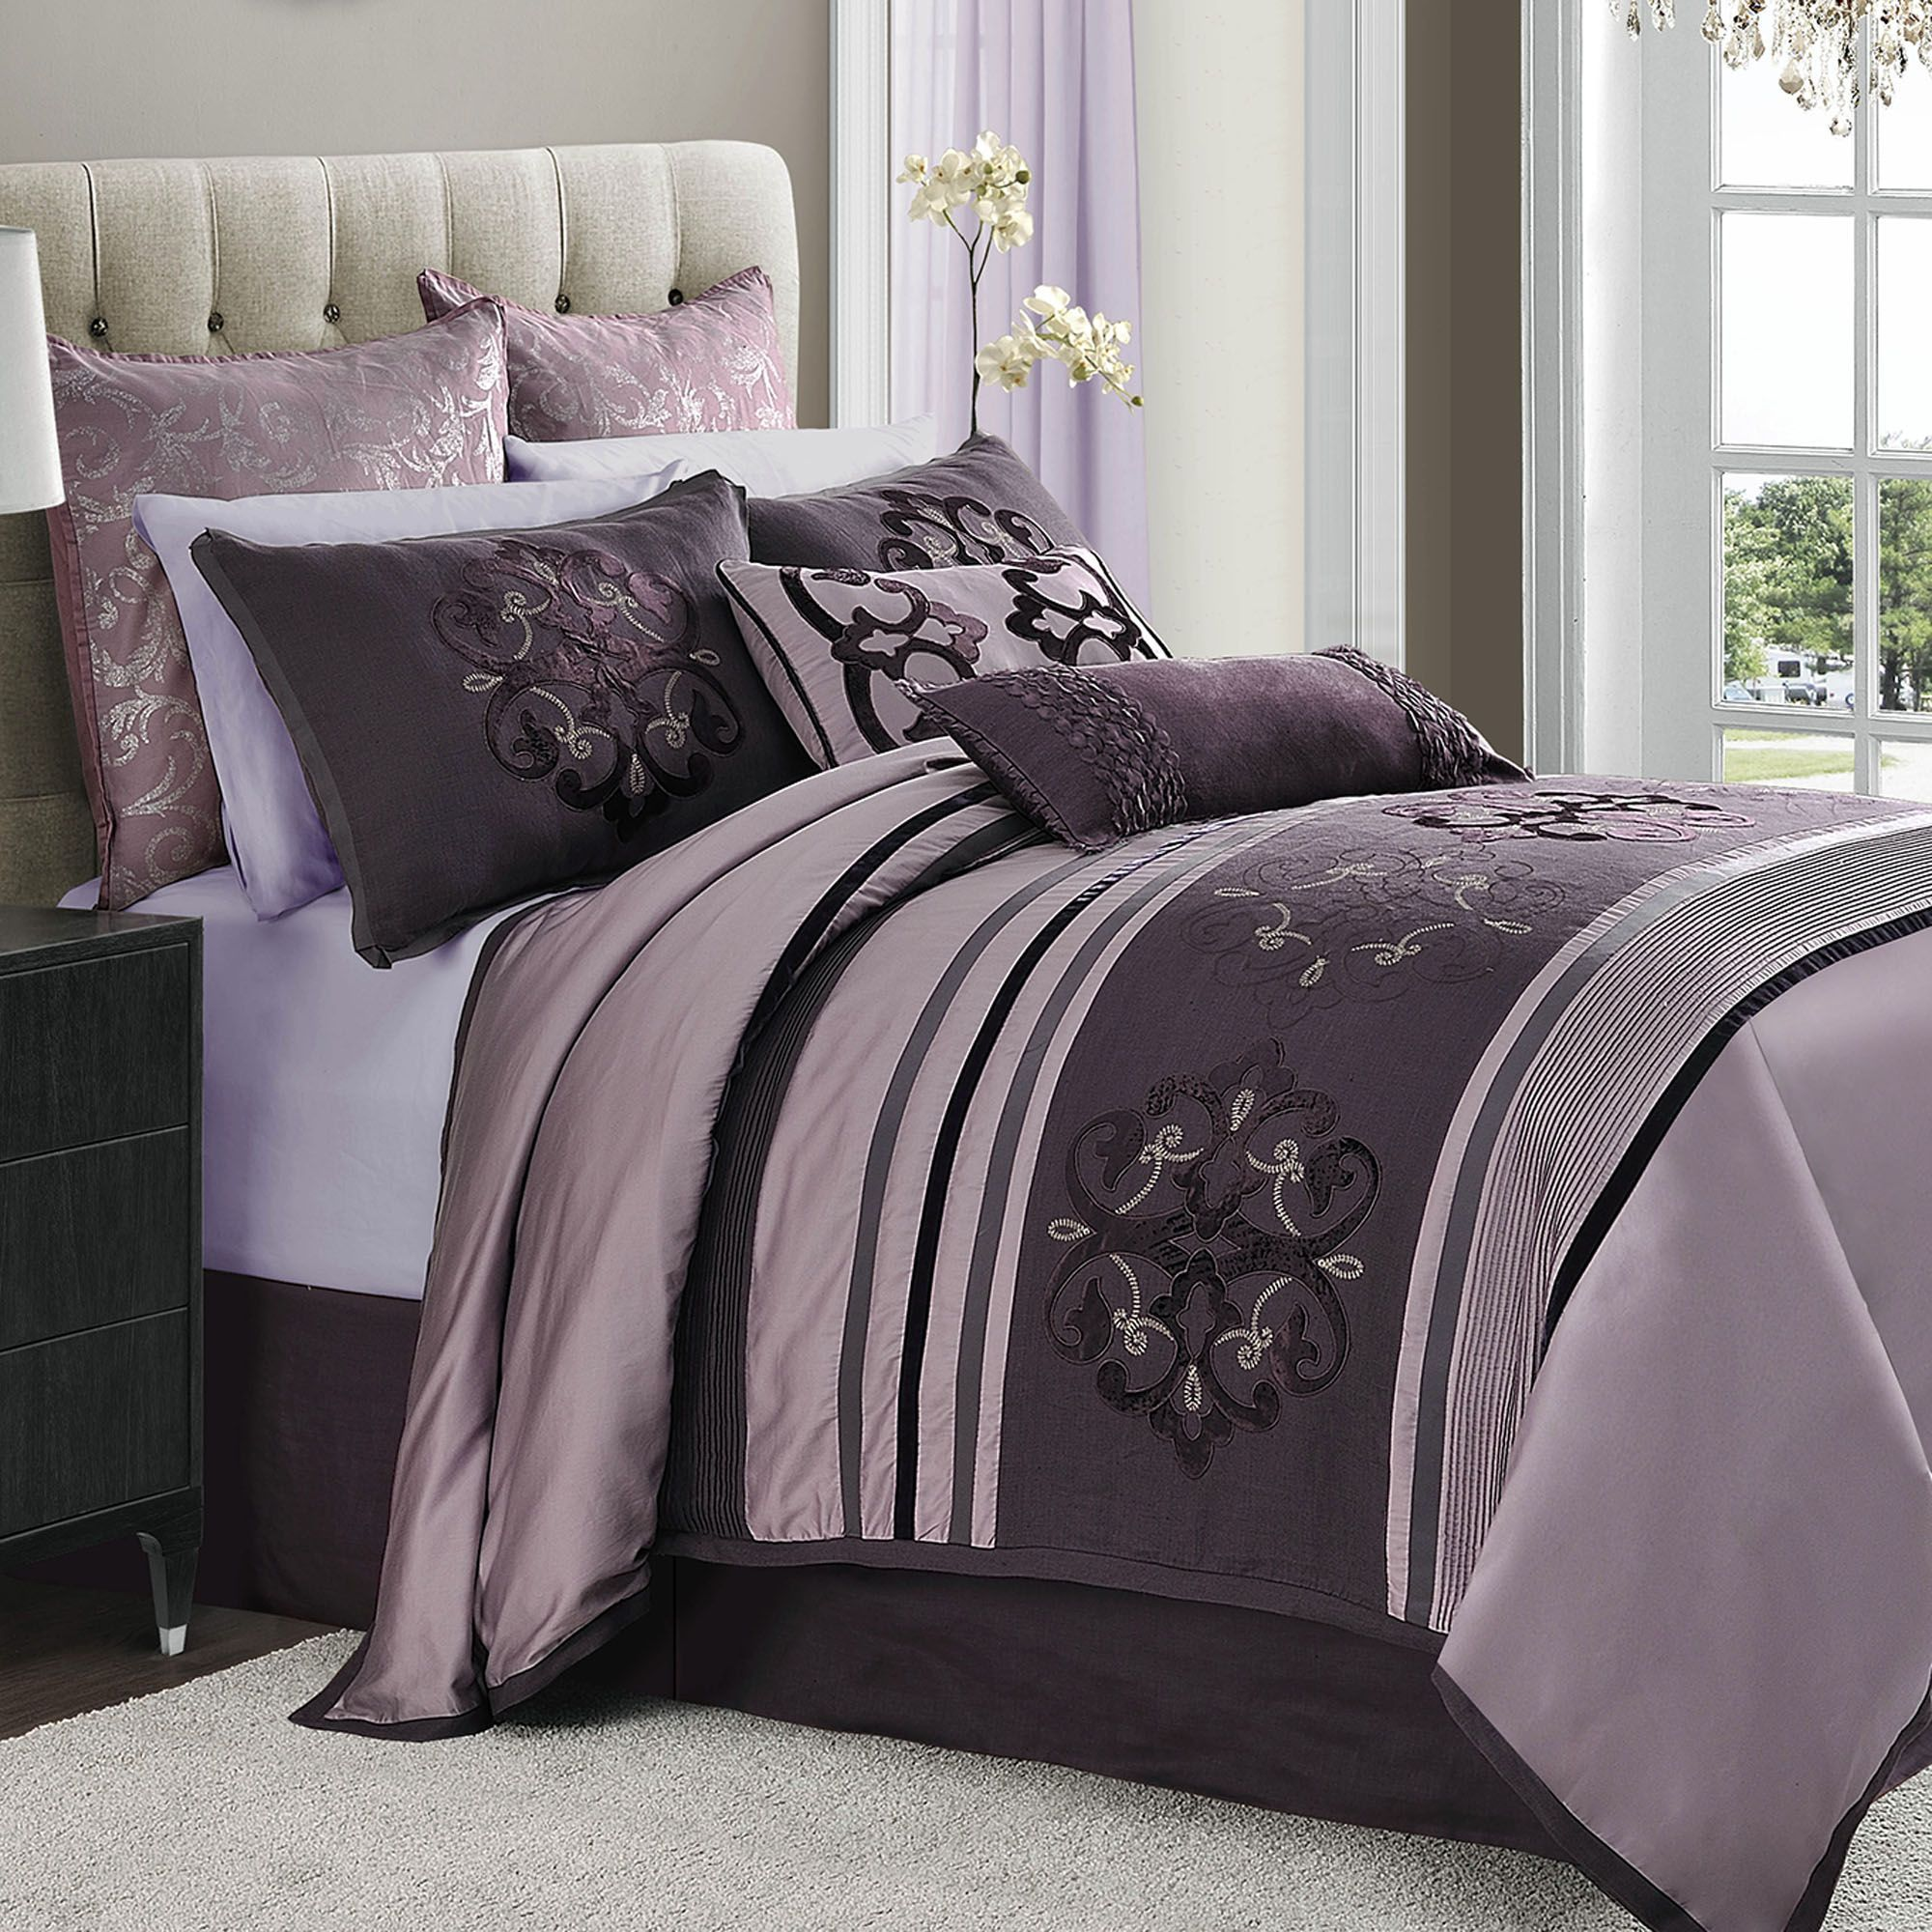 Bedroom Ideas Plum jolie comforter set lilac | plum comforter, comforter and plum bedding